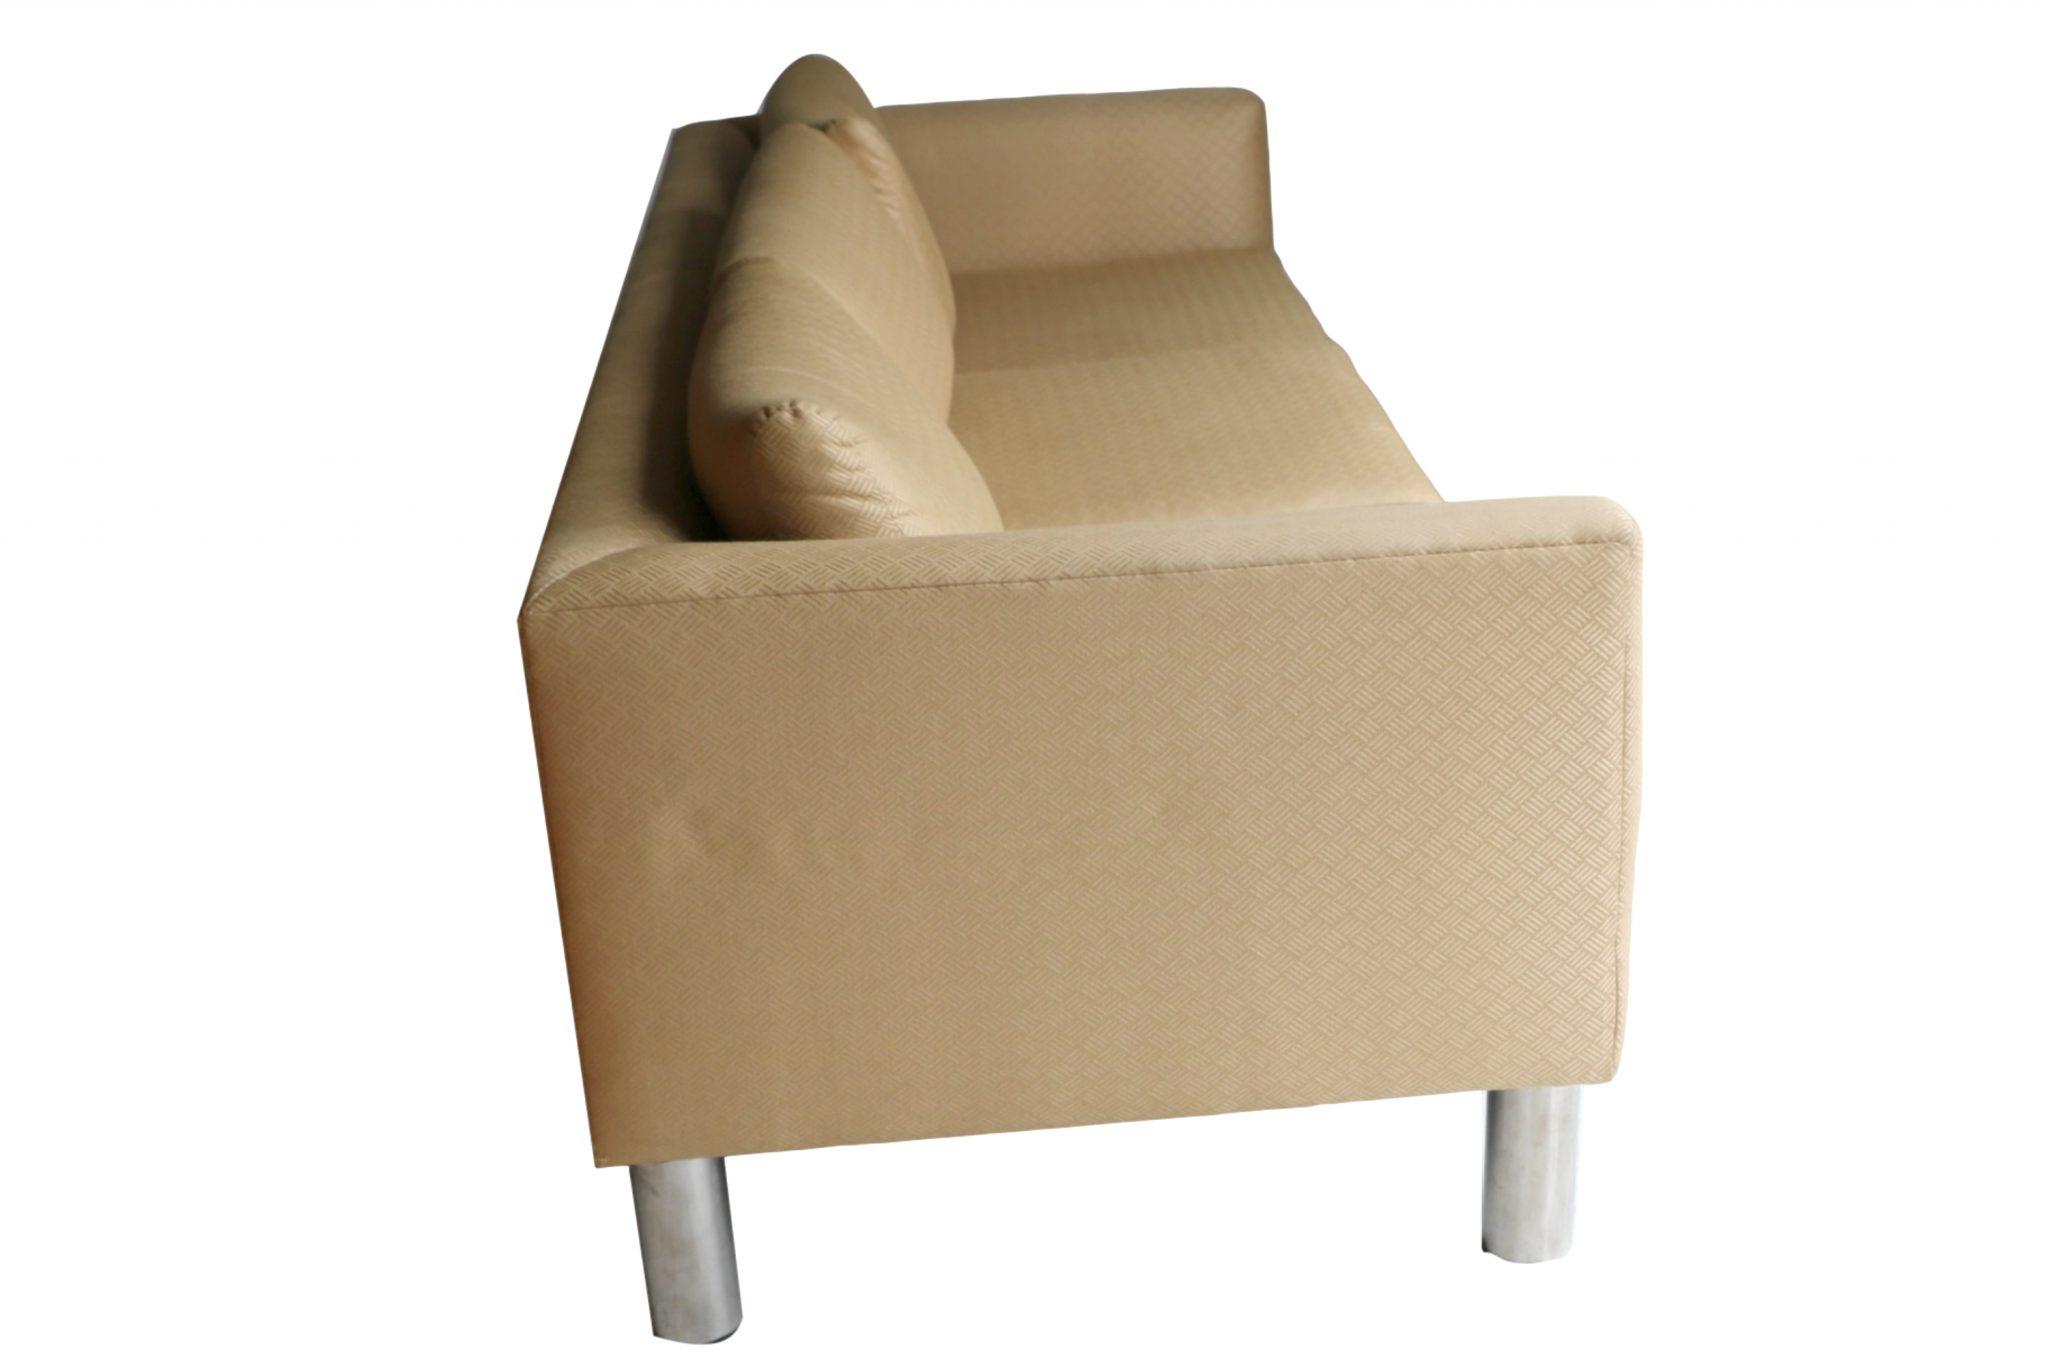 A Mid Century Modern Chrome Leg Sofa